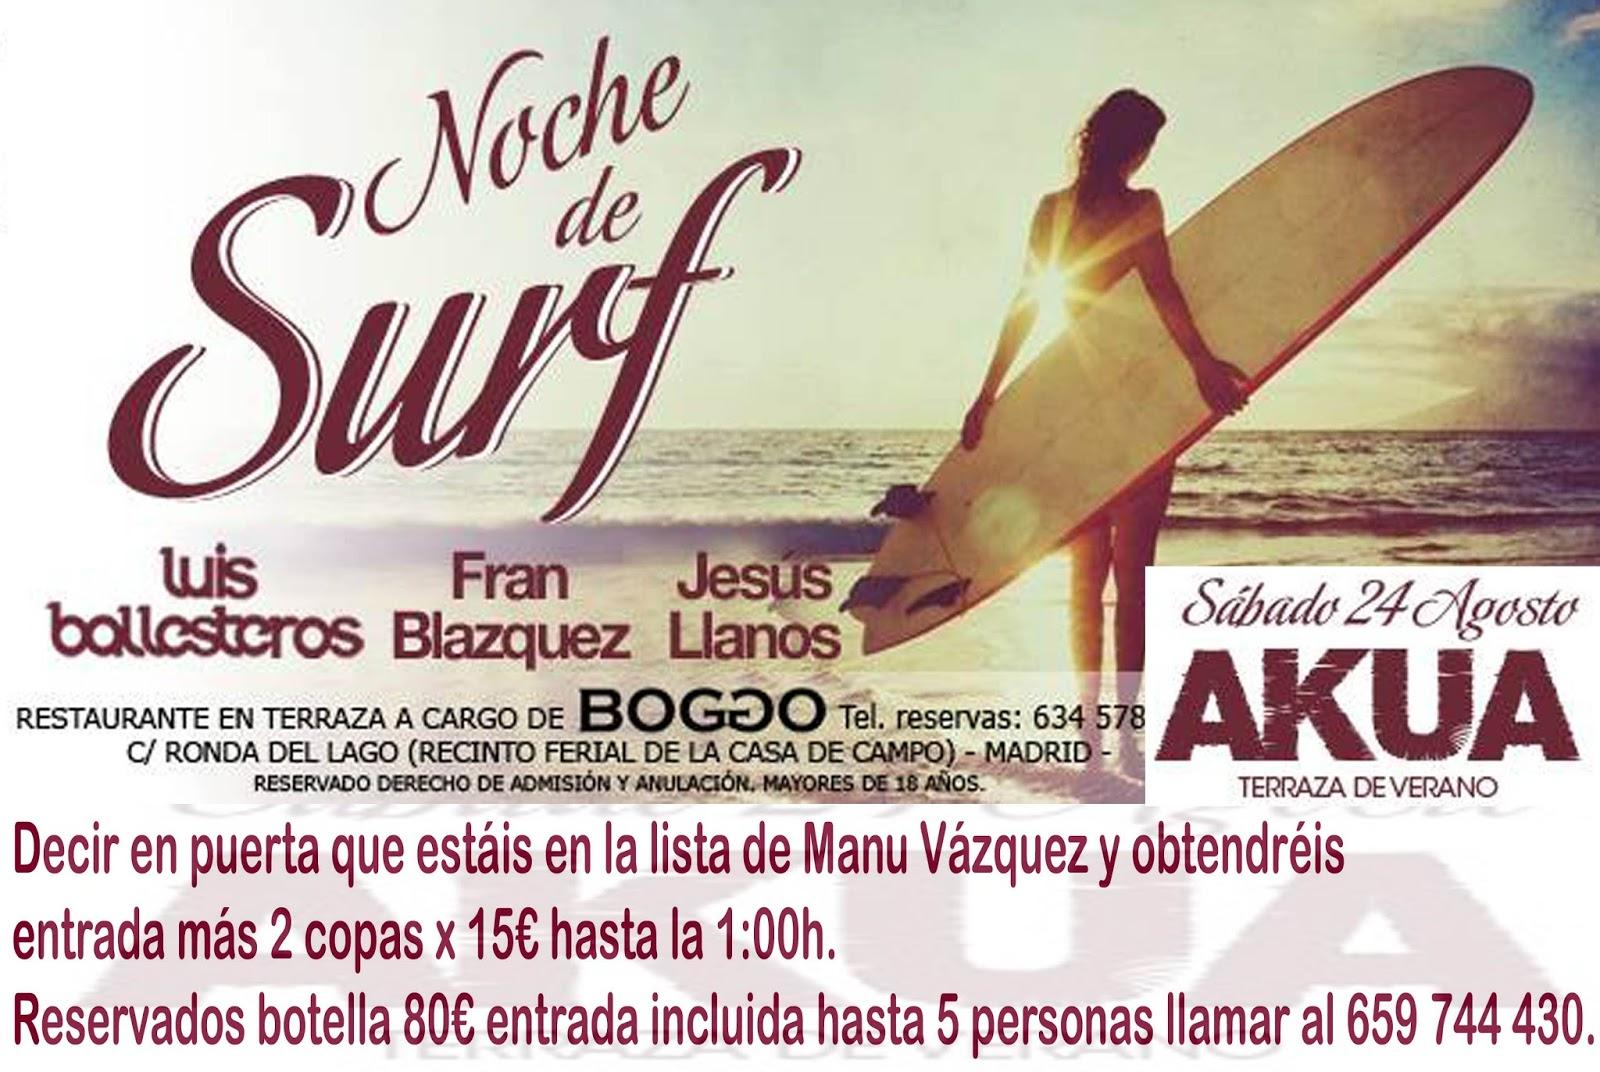 Rr Pp Discoteca Terraza Akua Madrid Sábado 24 Noche De Surf